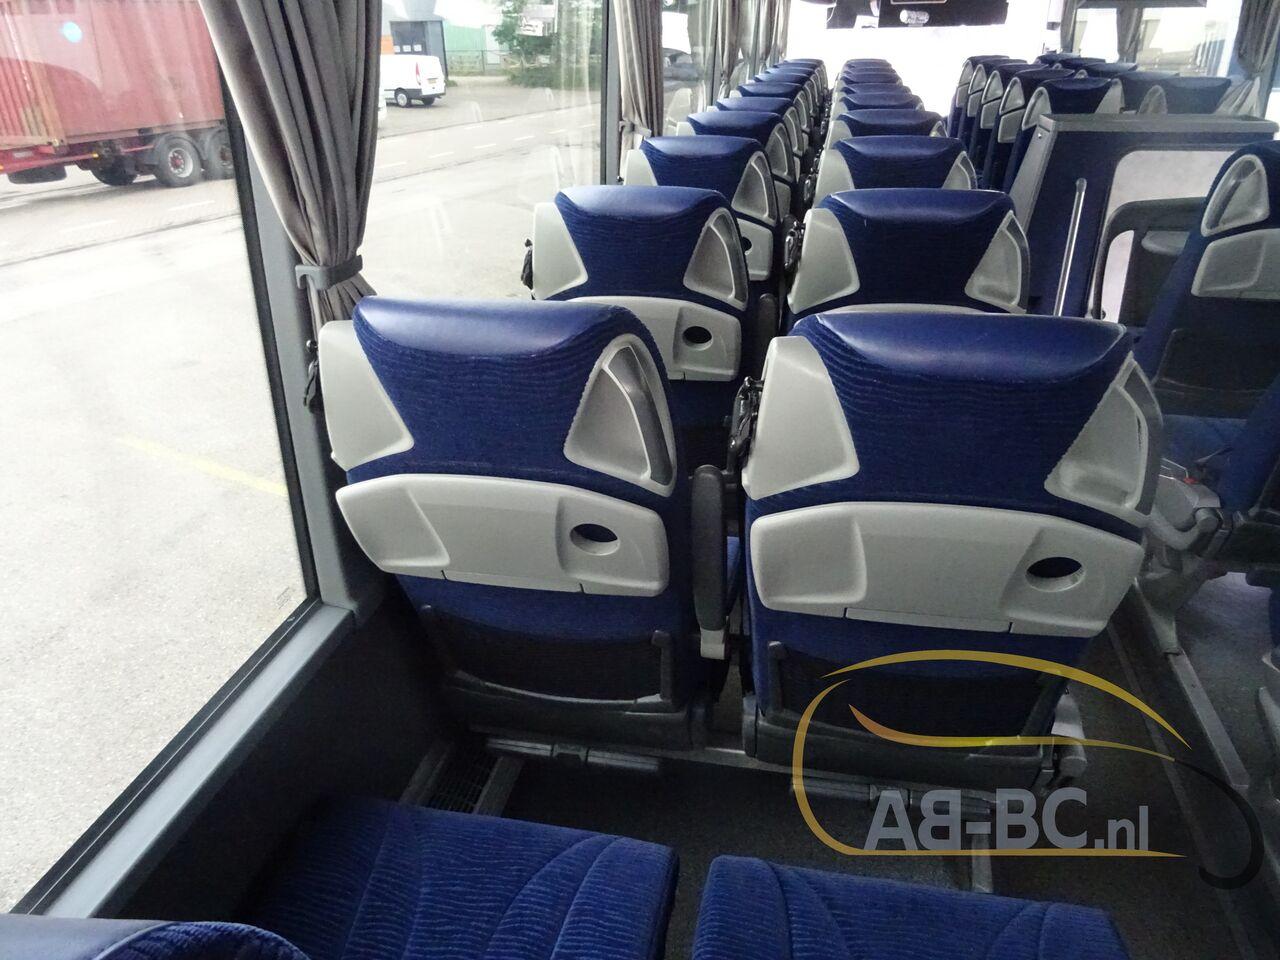 coach-busSETRA-S415-GT-HD-FINAL-EDITION---1627457305113260666_big_7bbfeb23bb90508dbc8965463d0de4bd--21050713010665719300